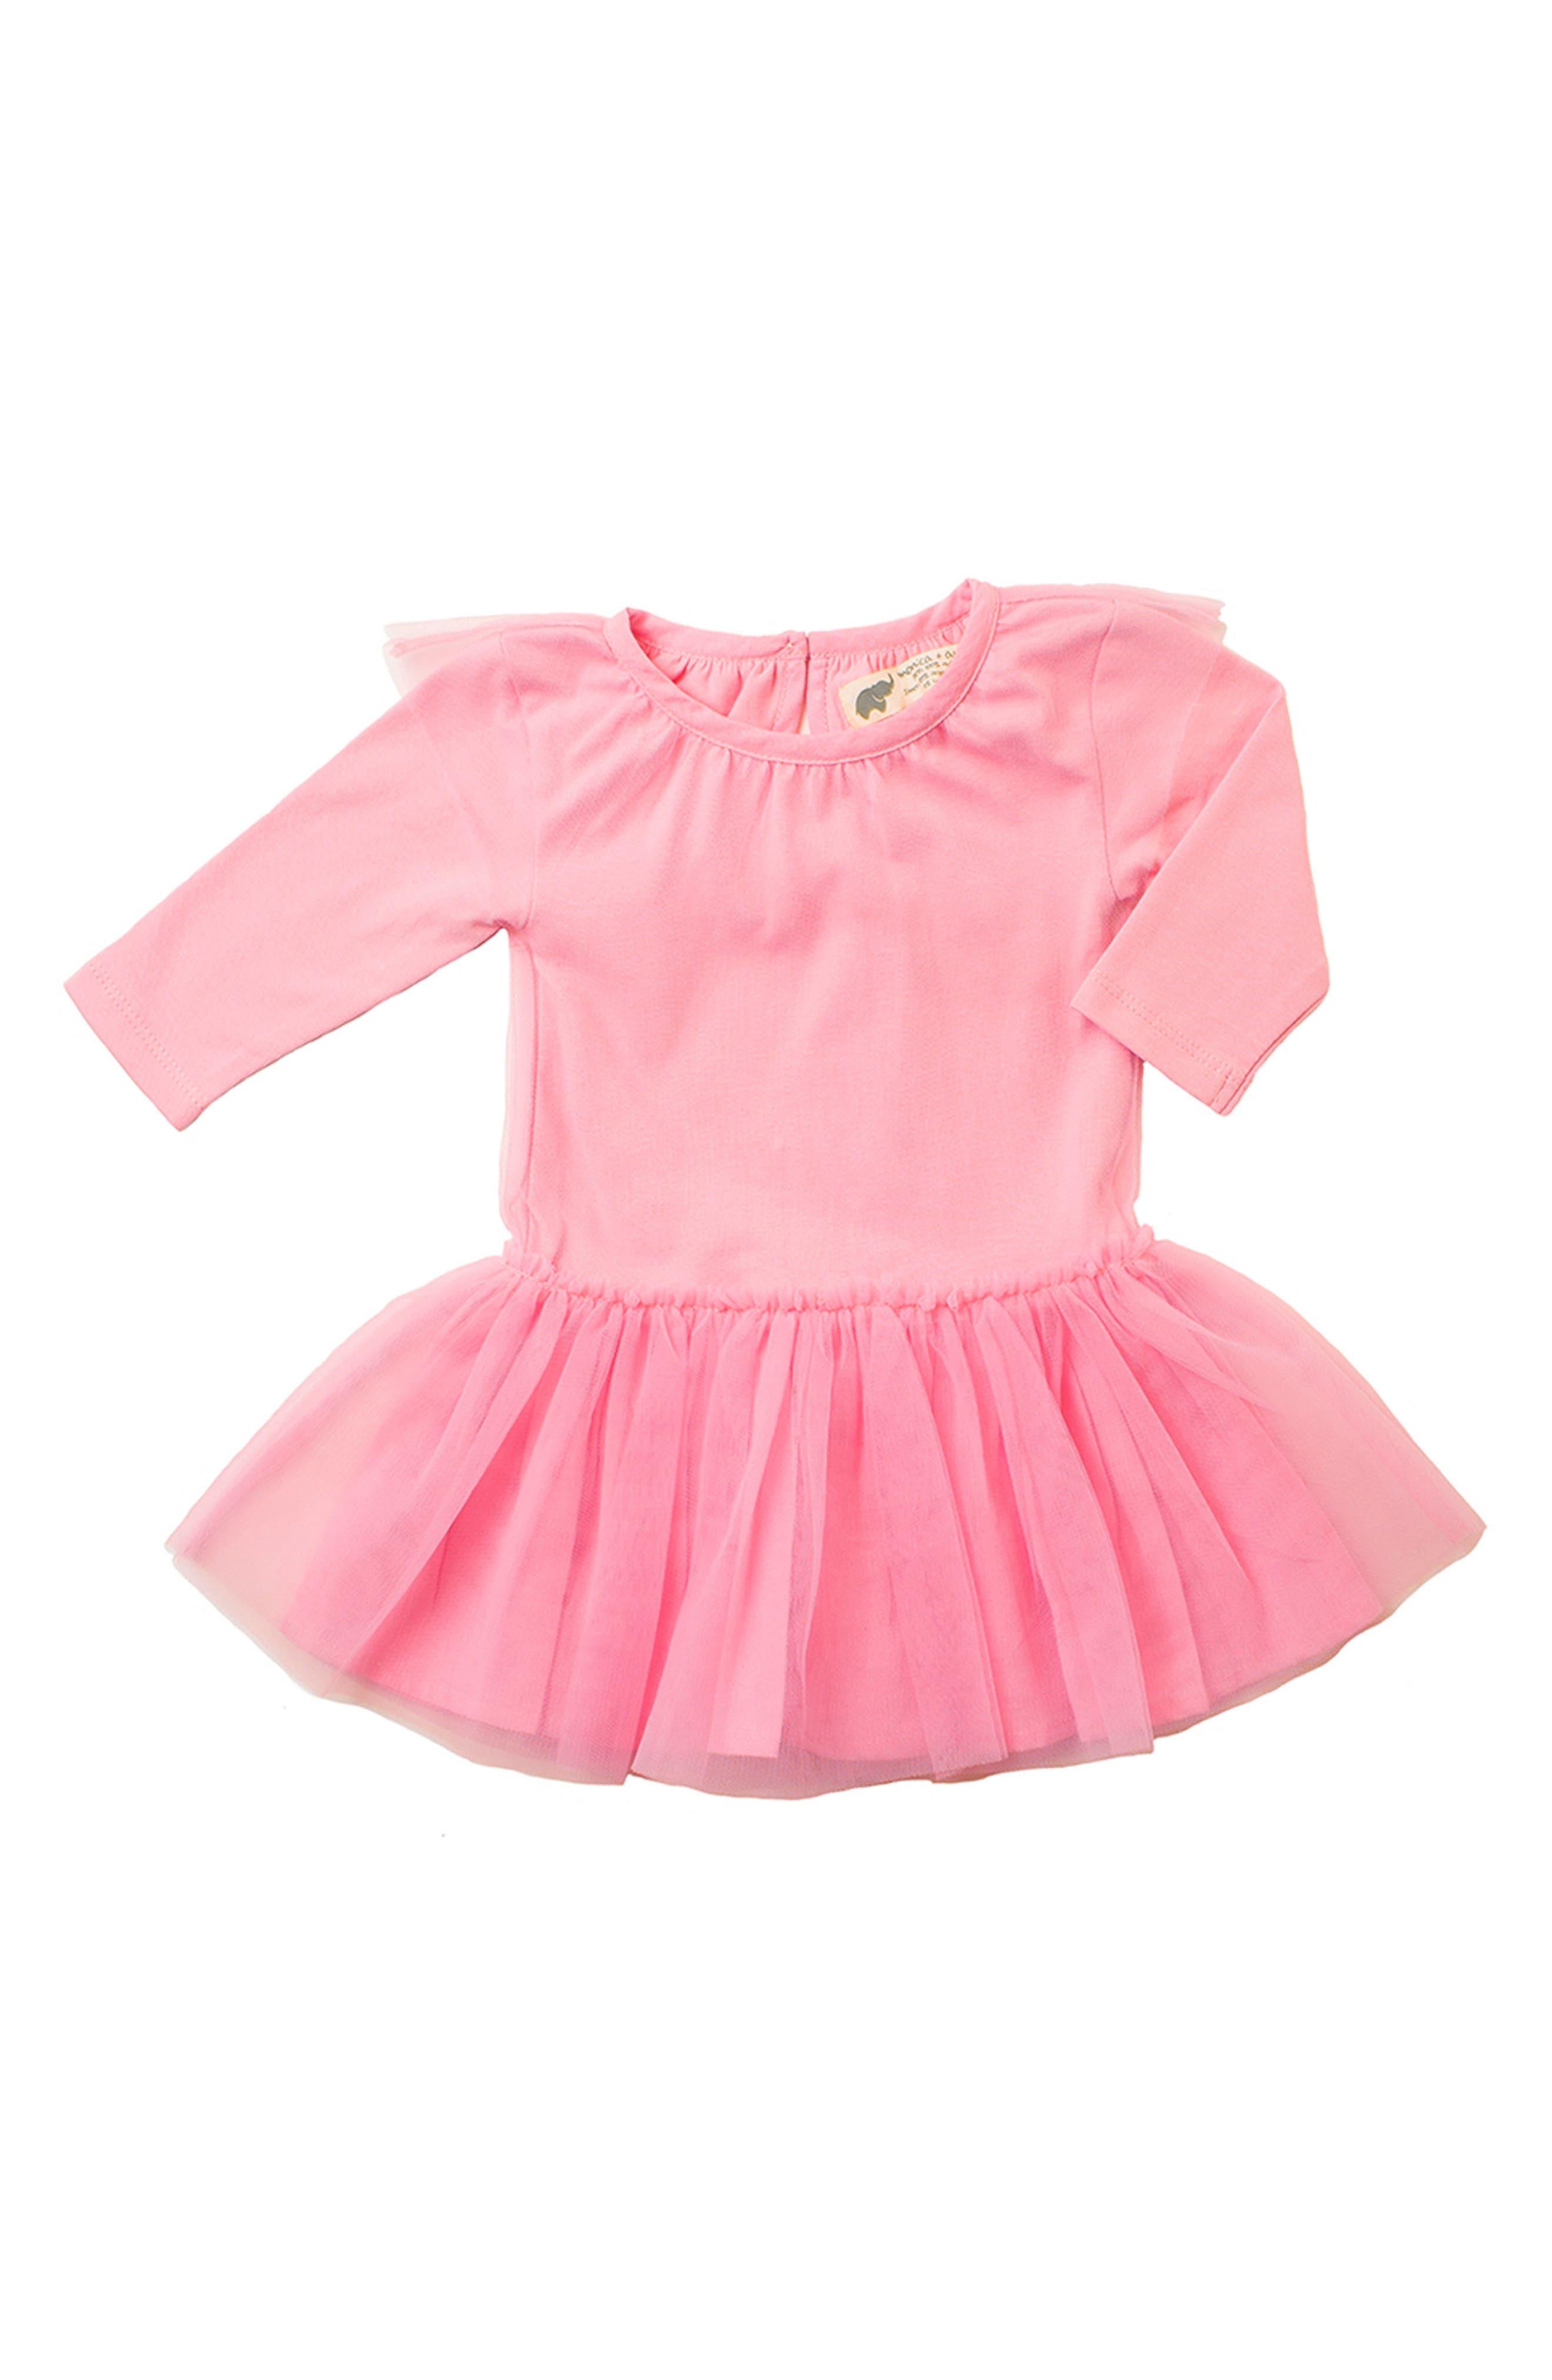 Little Belle Tulle Dress,                             Main thumbnail 1, color,                             Hot Pink